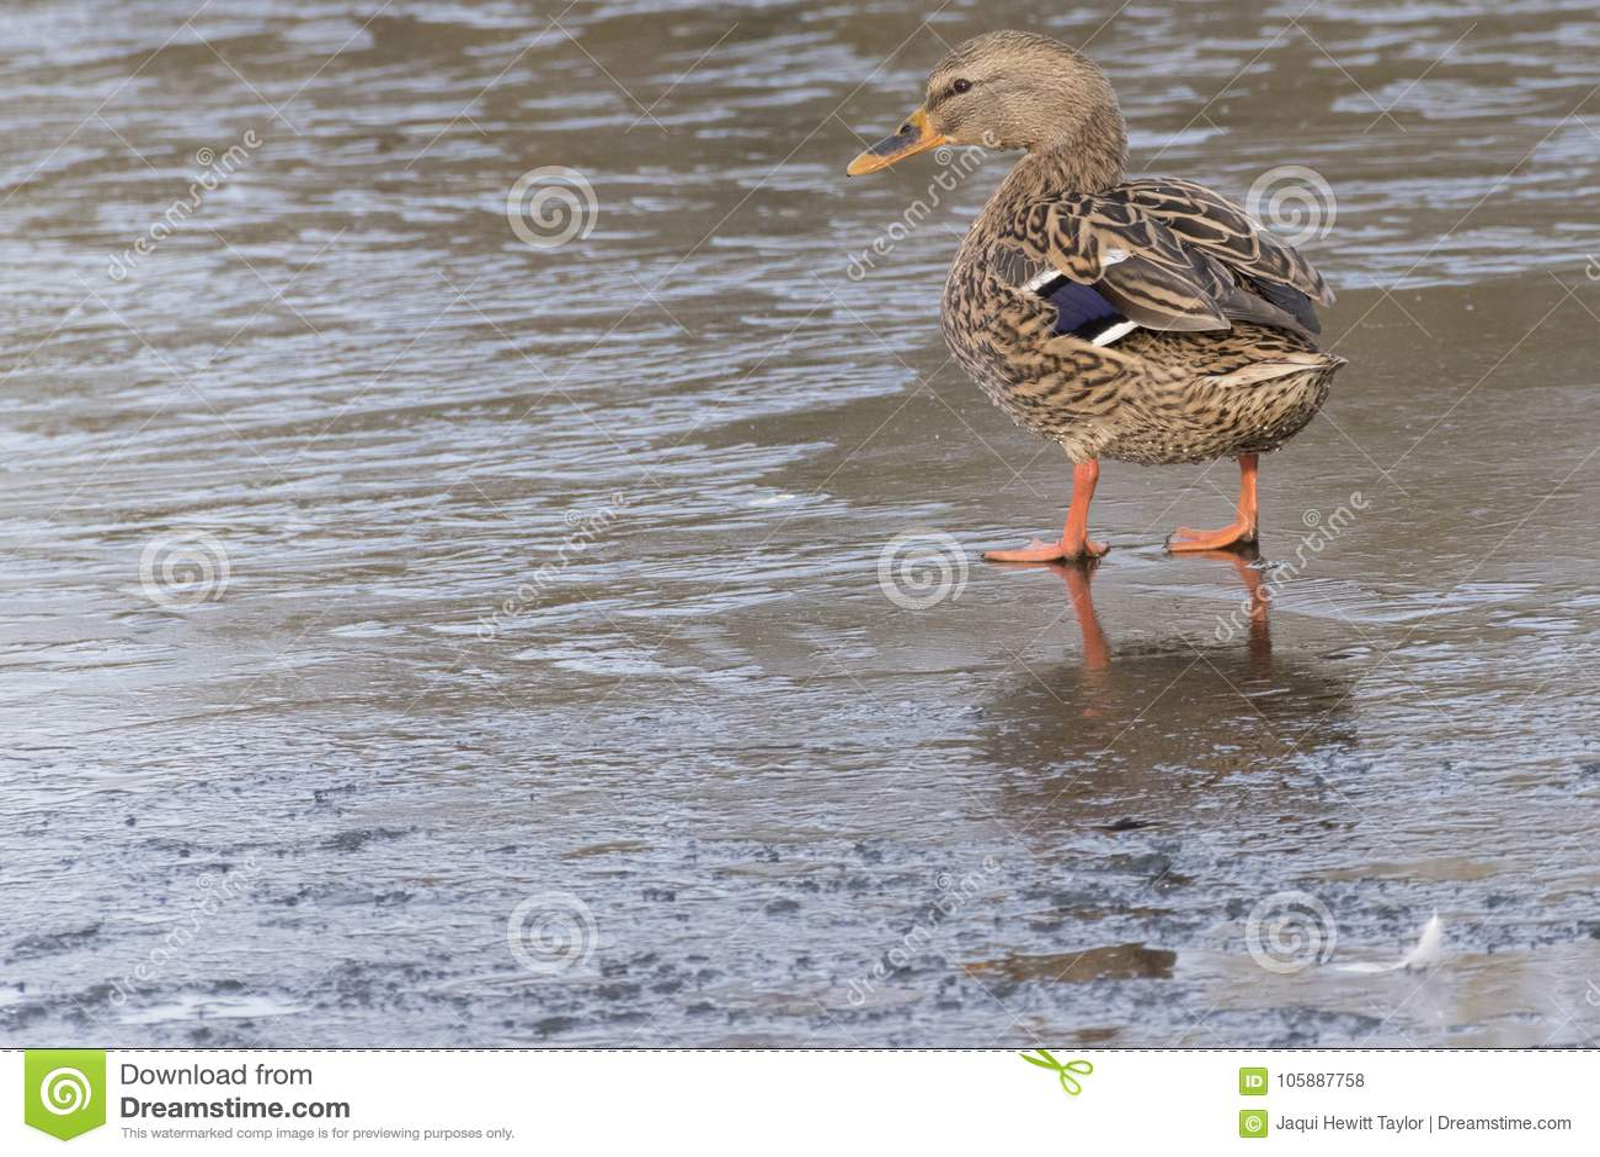 A mallard duck standing on ice